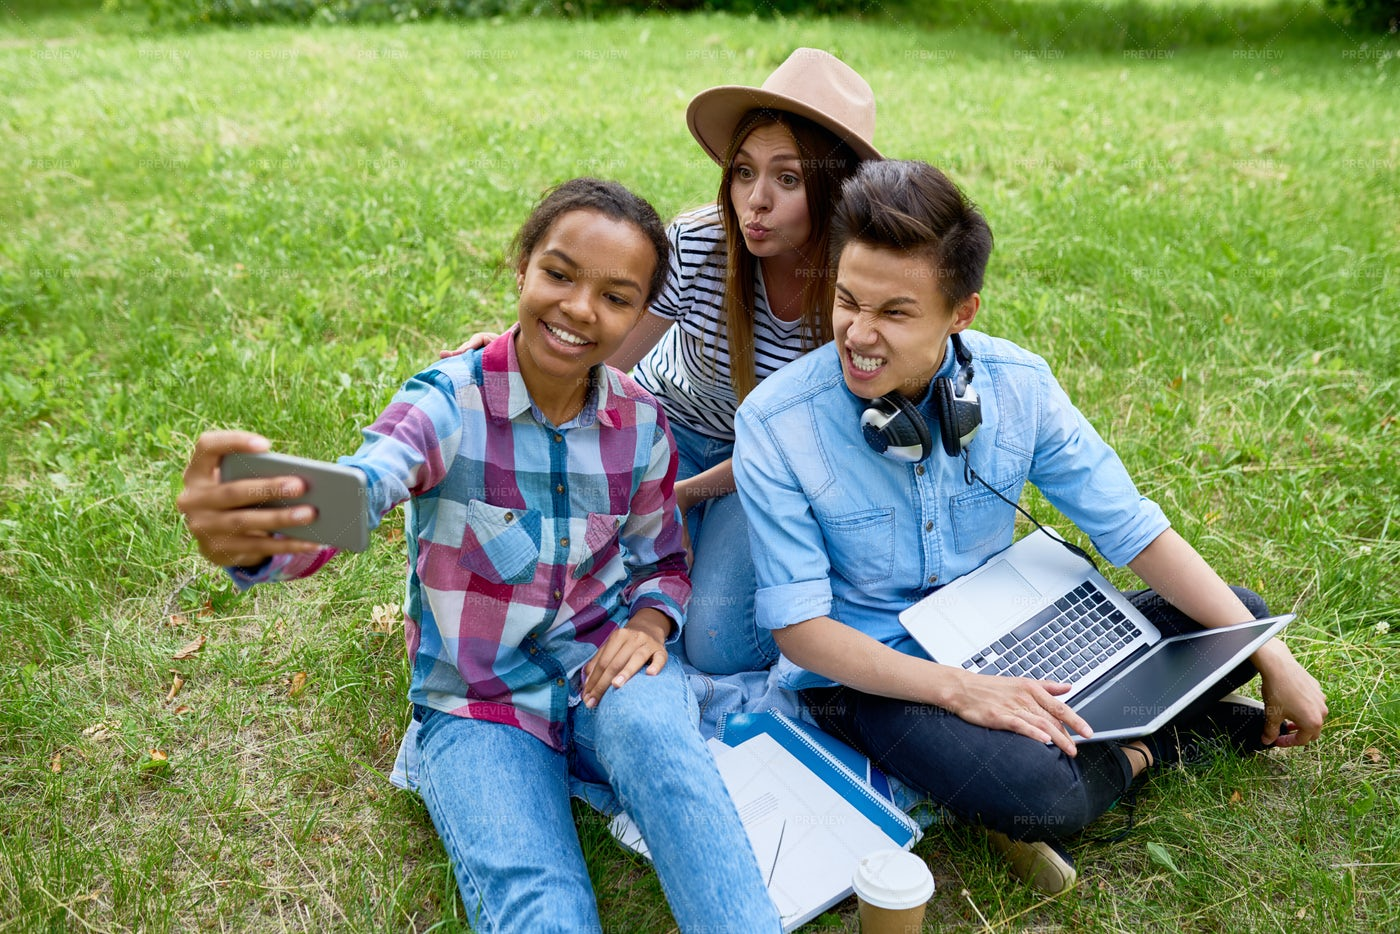 Grimacing Teenagers Taking Selfie...: Stock Photos